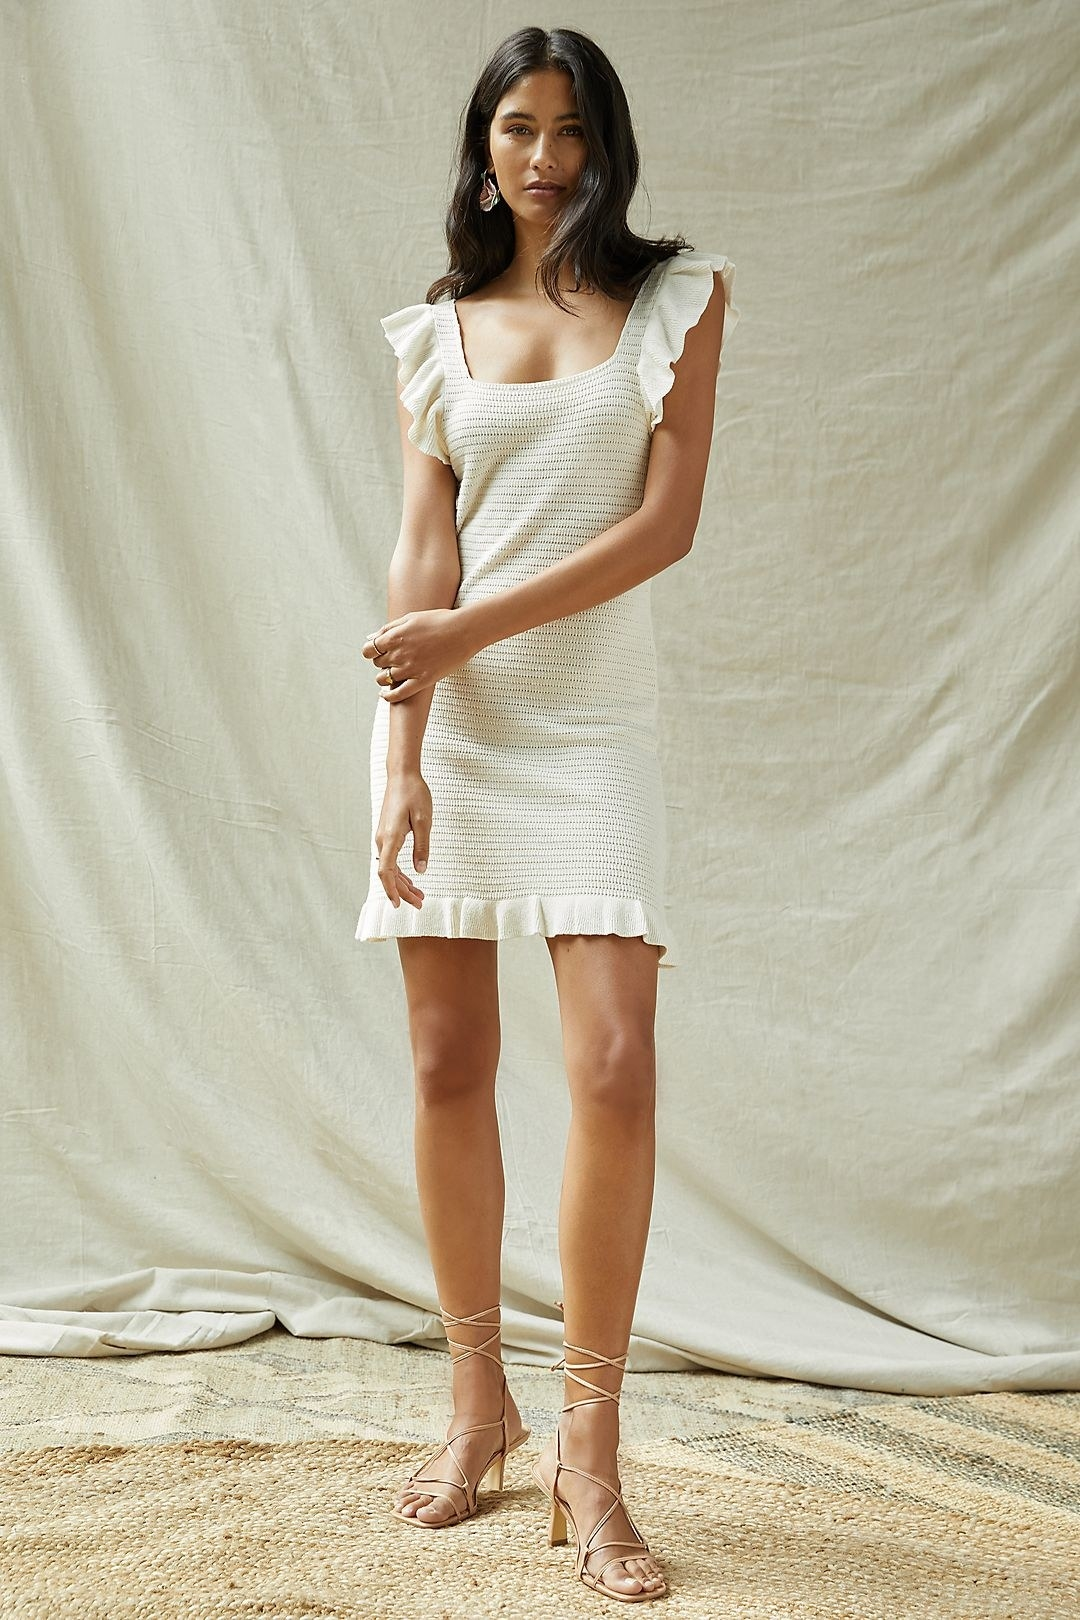 model wearing the cream dress